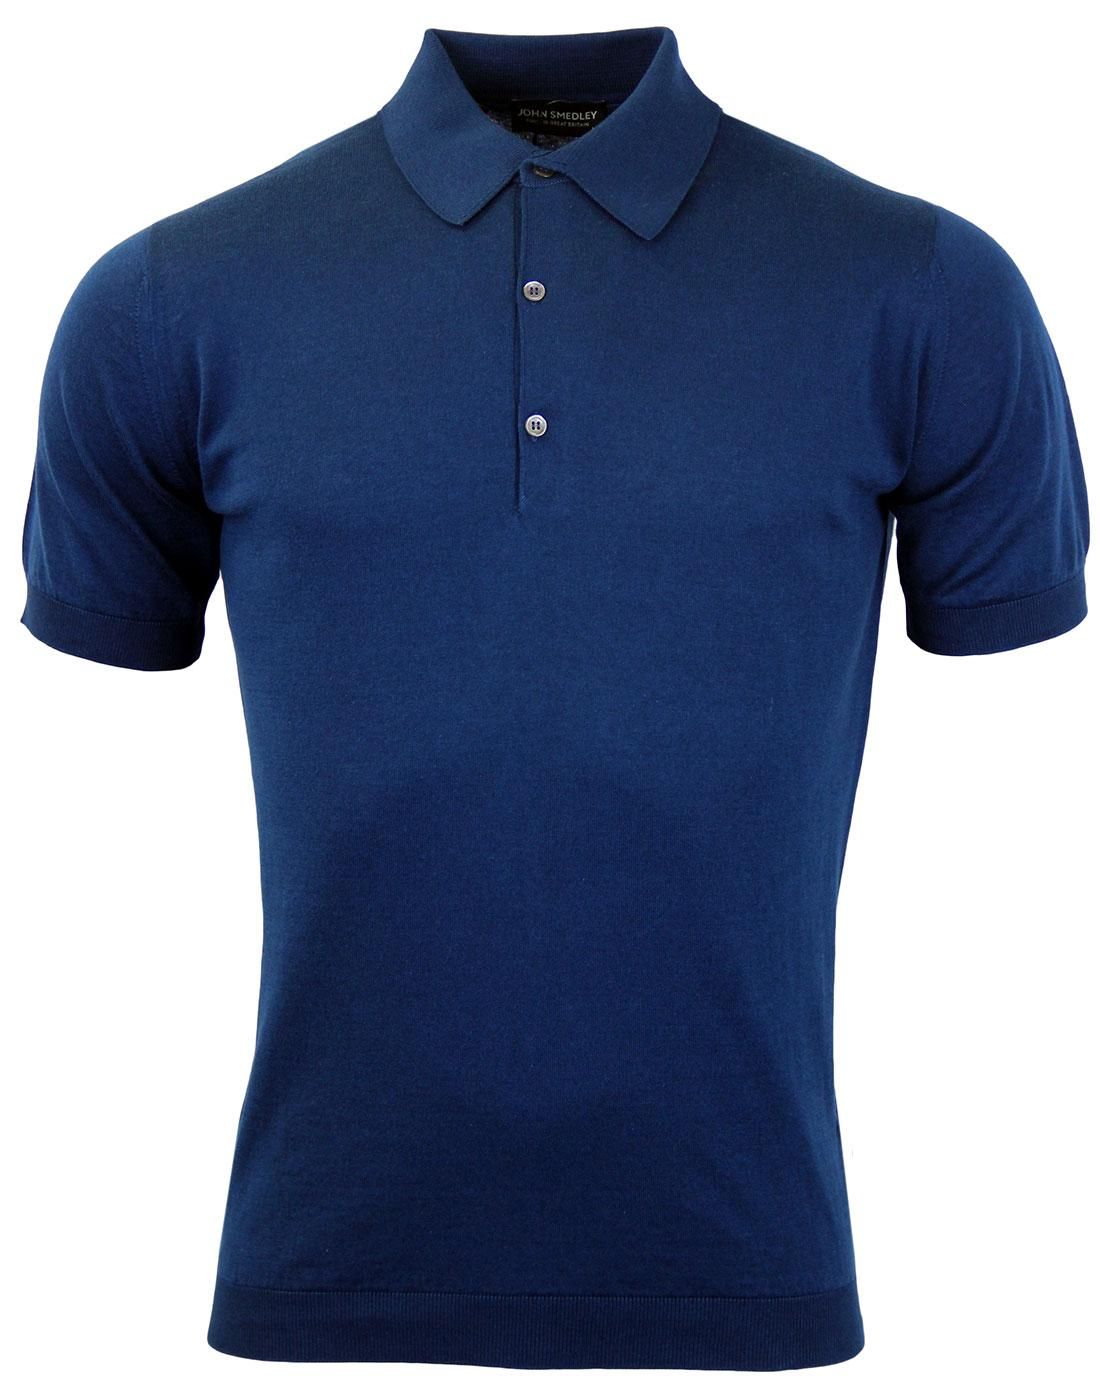 Adrian JOHN SMEDLEY Mens Mod Knitted Polo Shirt I